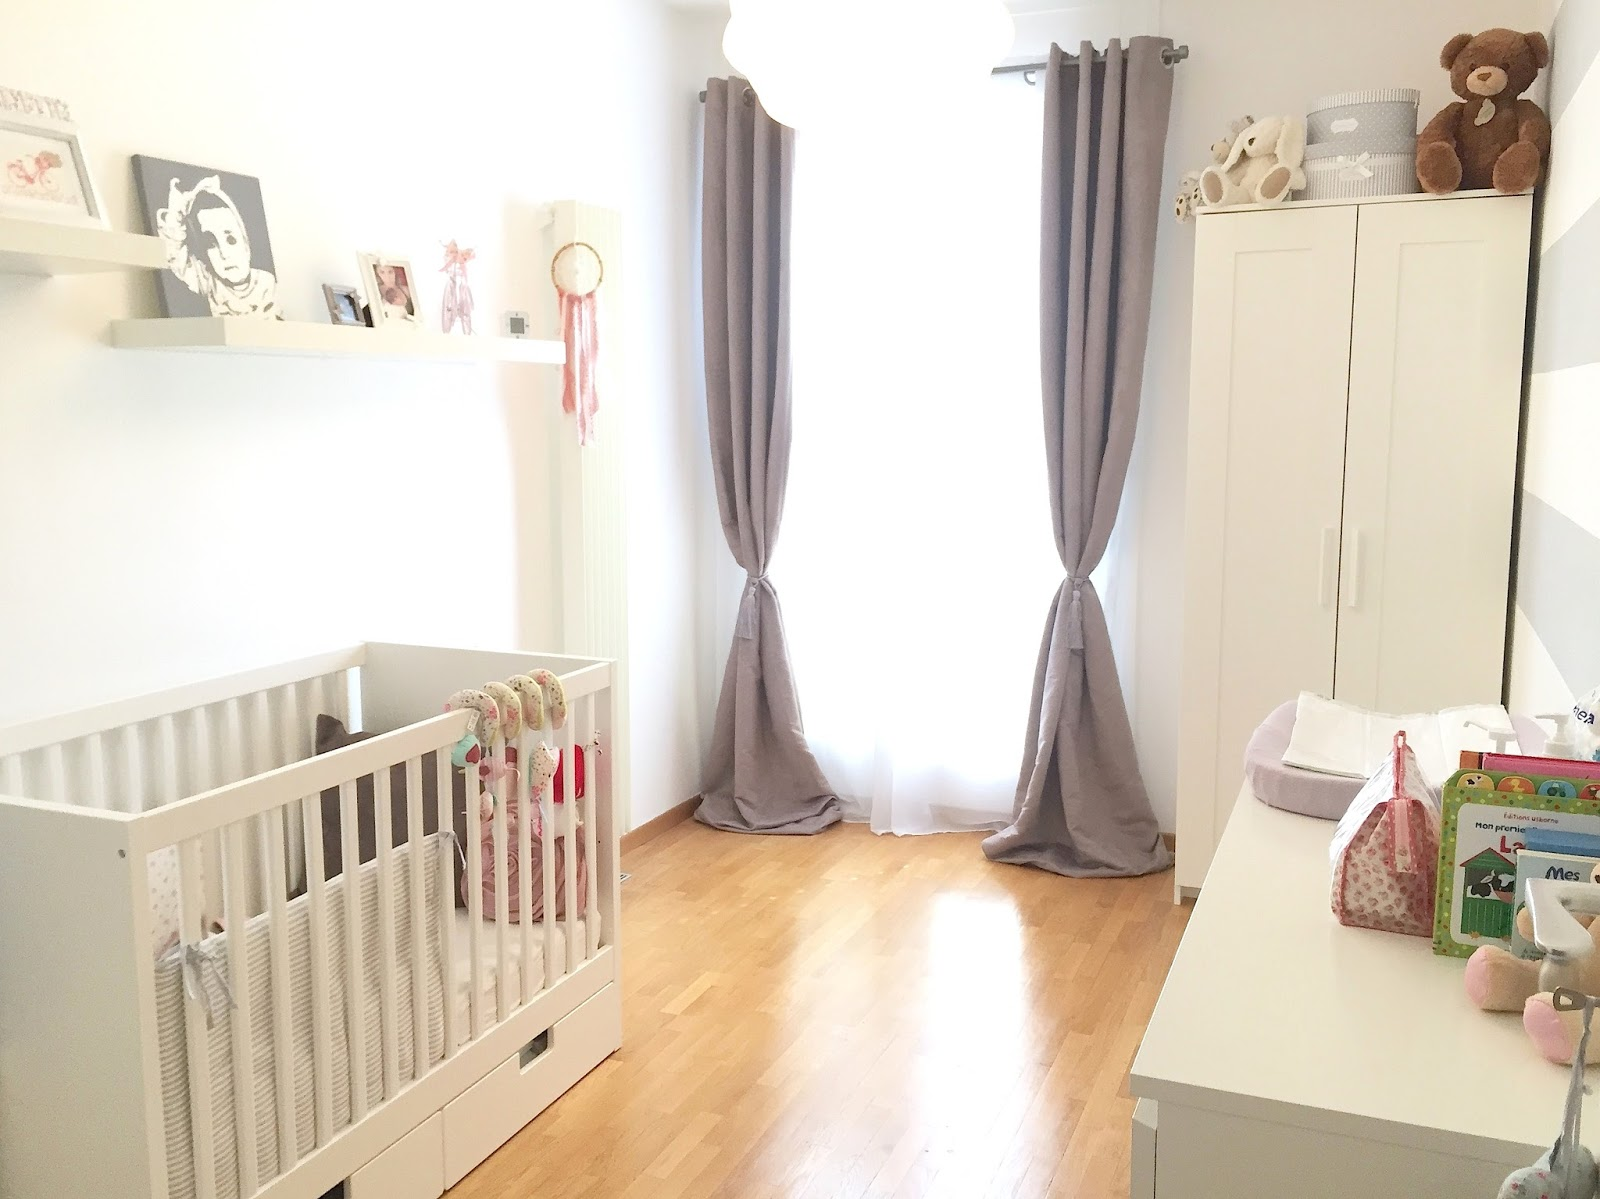 rideaux chambre b b ikea trainingsstalmaikewiebelitz. Black Bedroom Furniture Sets. Home Design Ideas